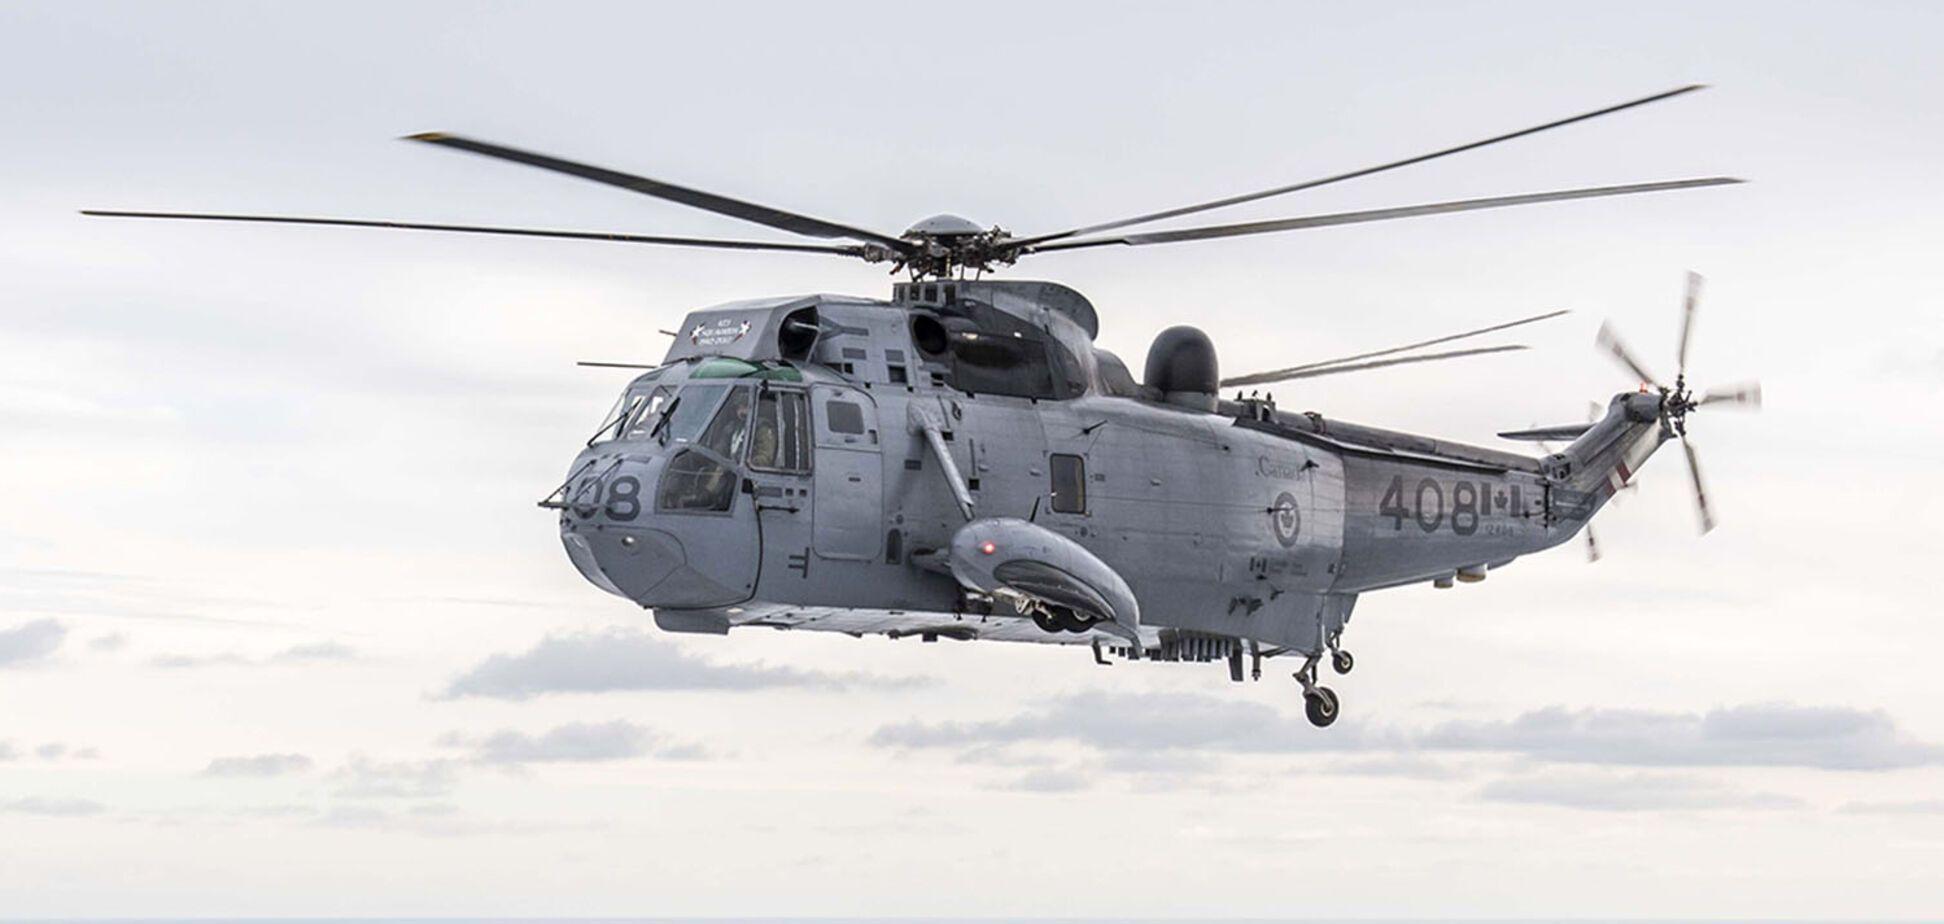 Sikorsky CH-124 Sea King